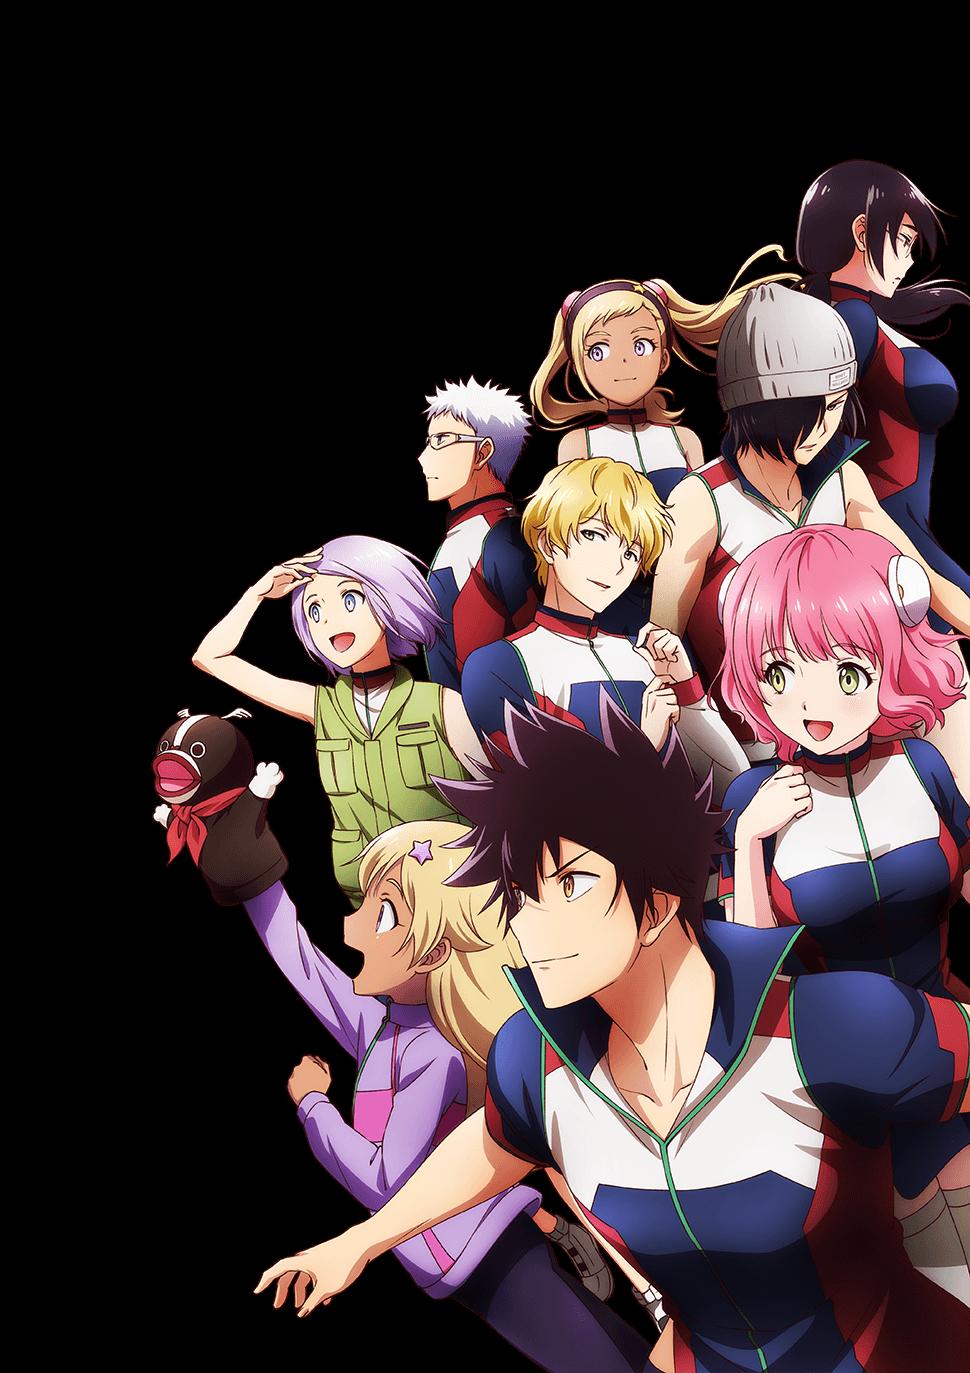 TVアニメ「彼方のアストラ」公式サイト